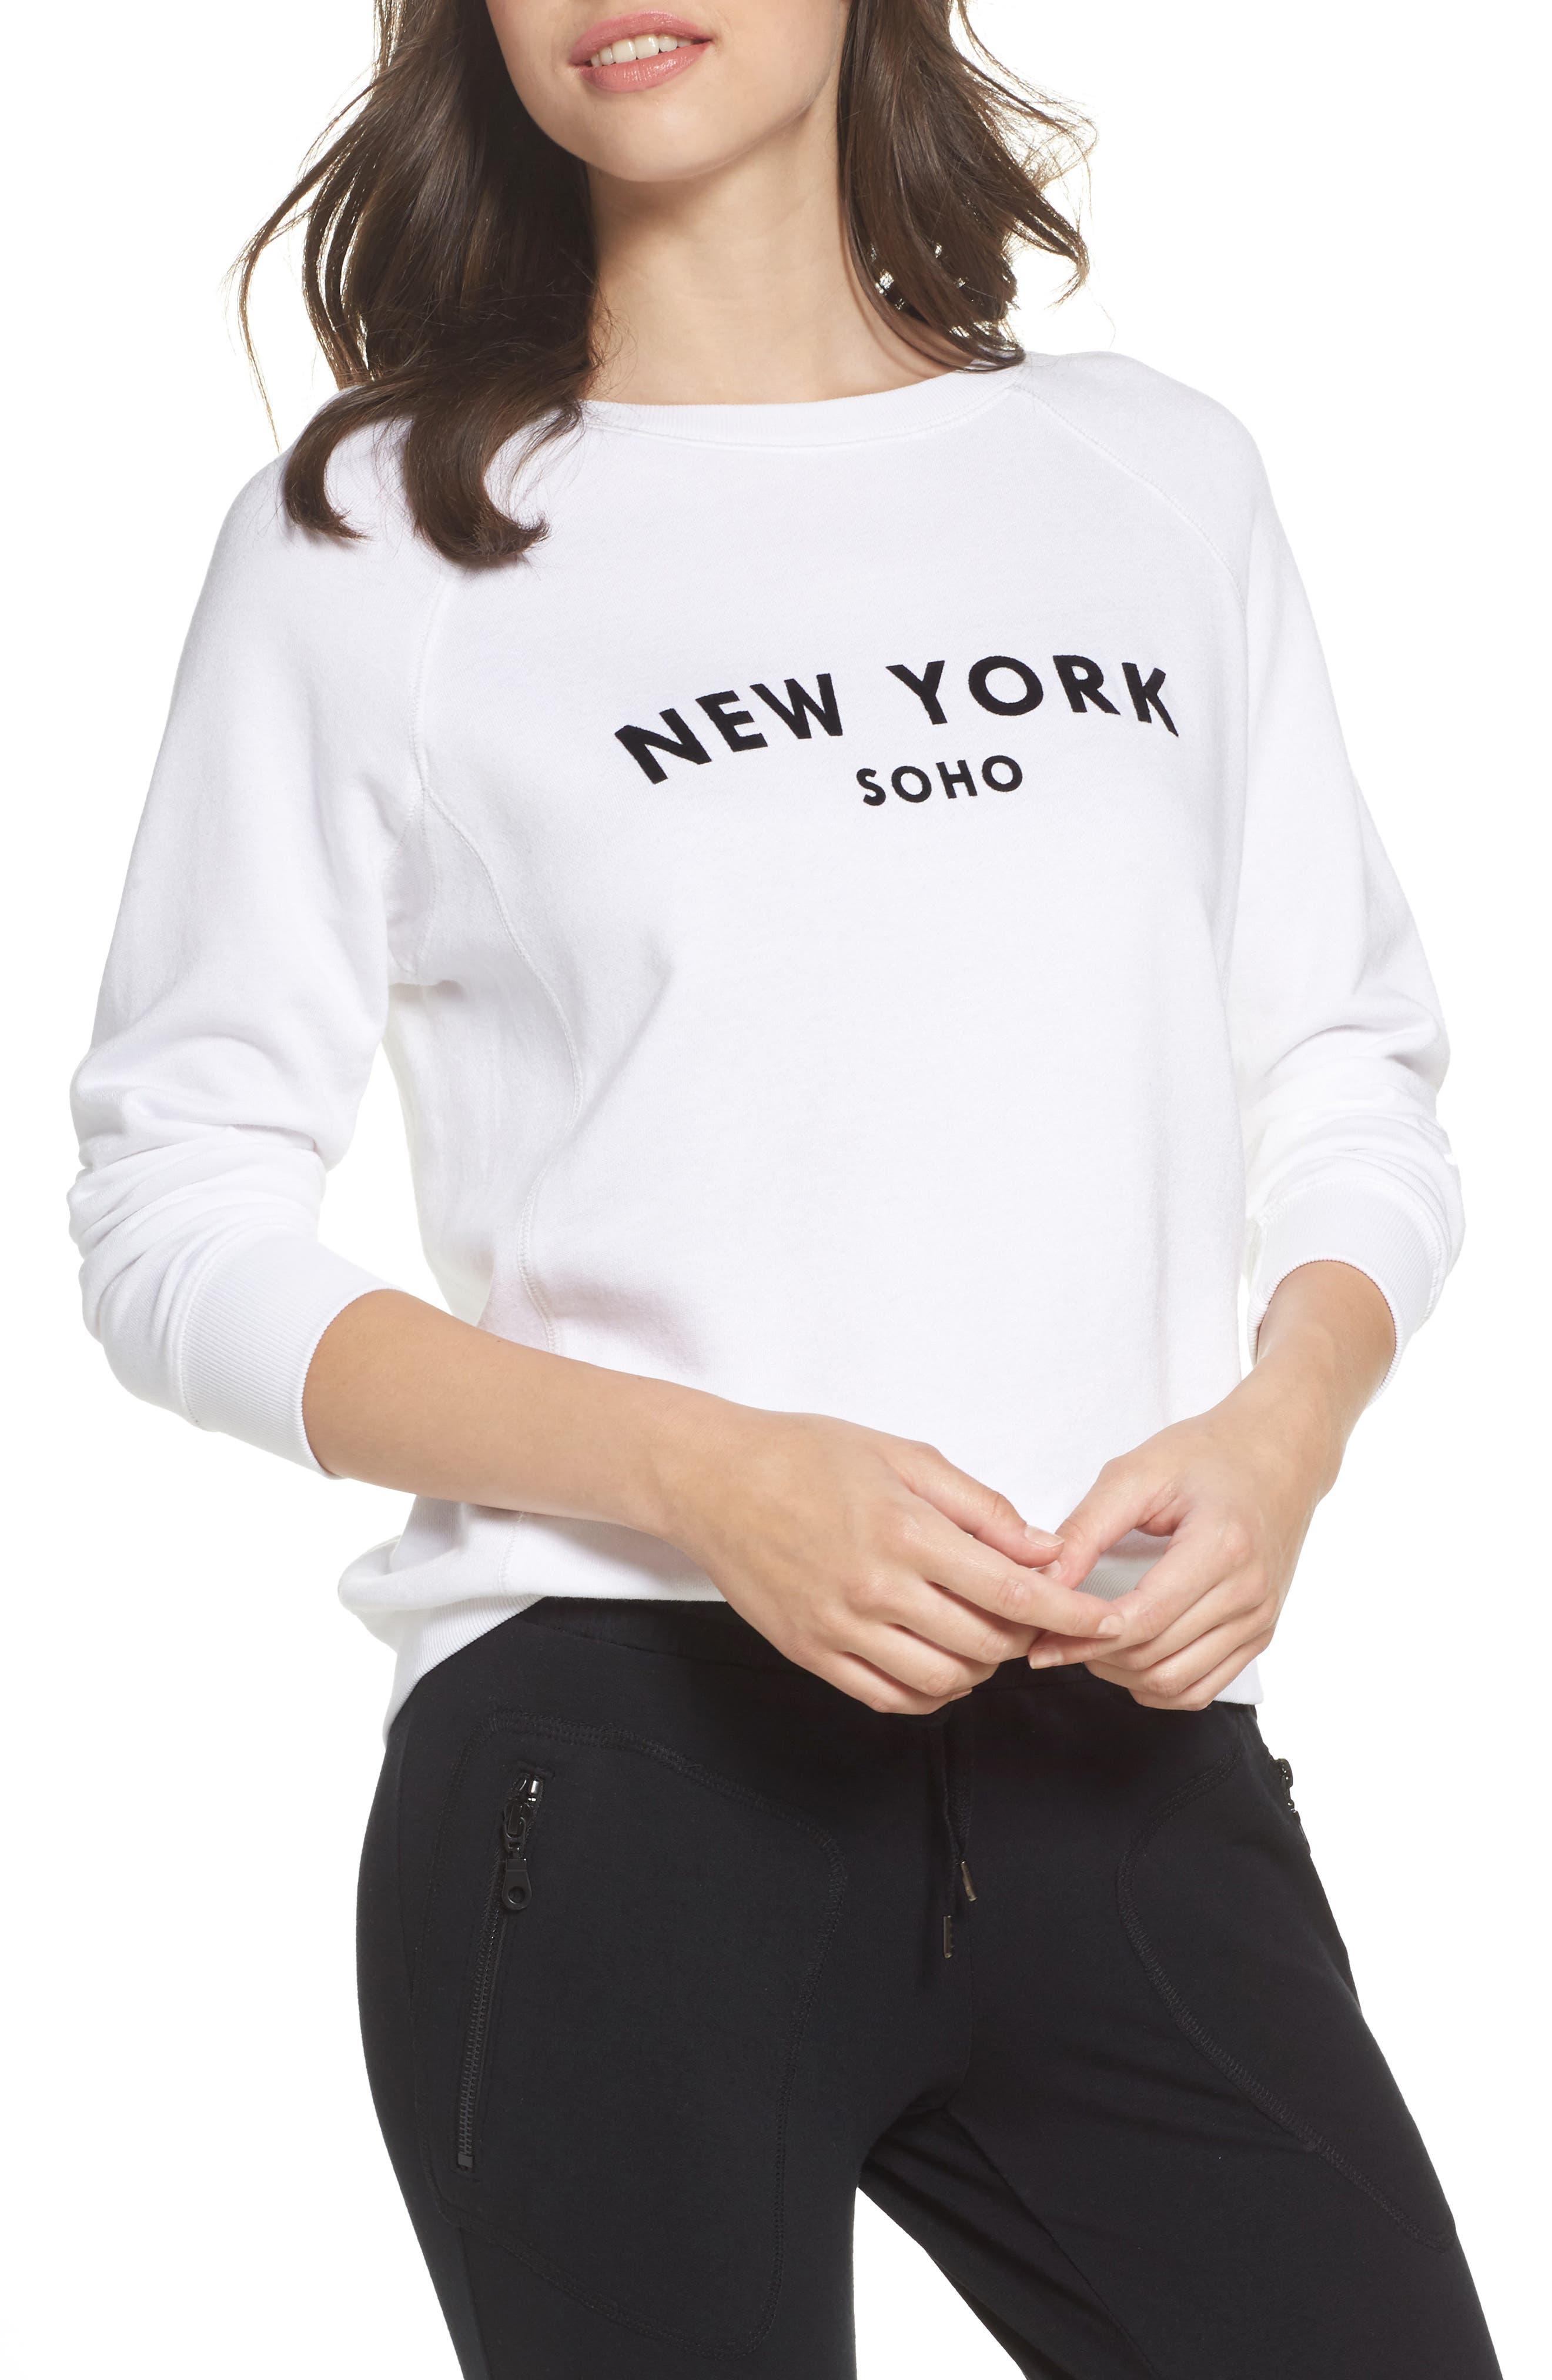 David Lerner New York Soho Raglan Pullover